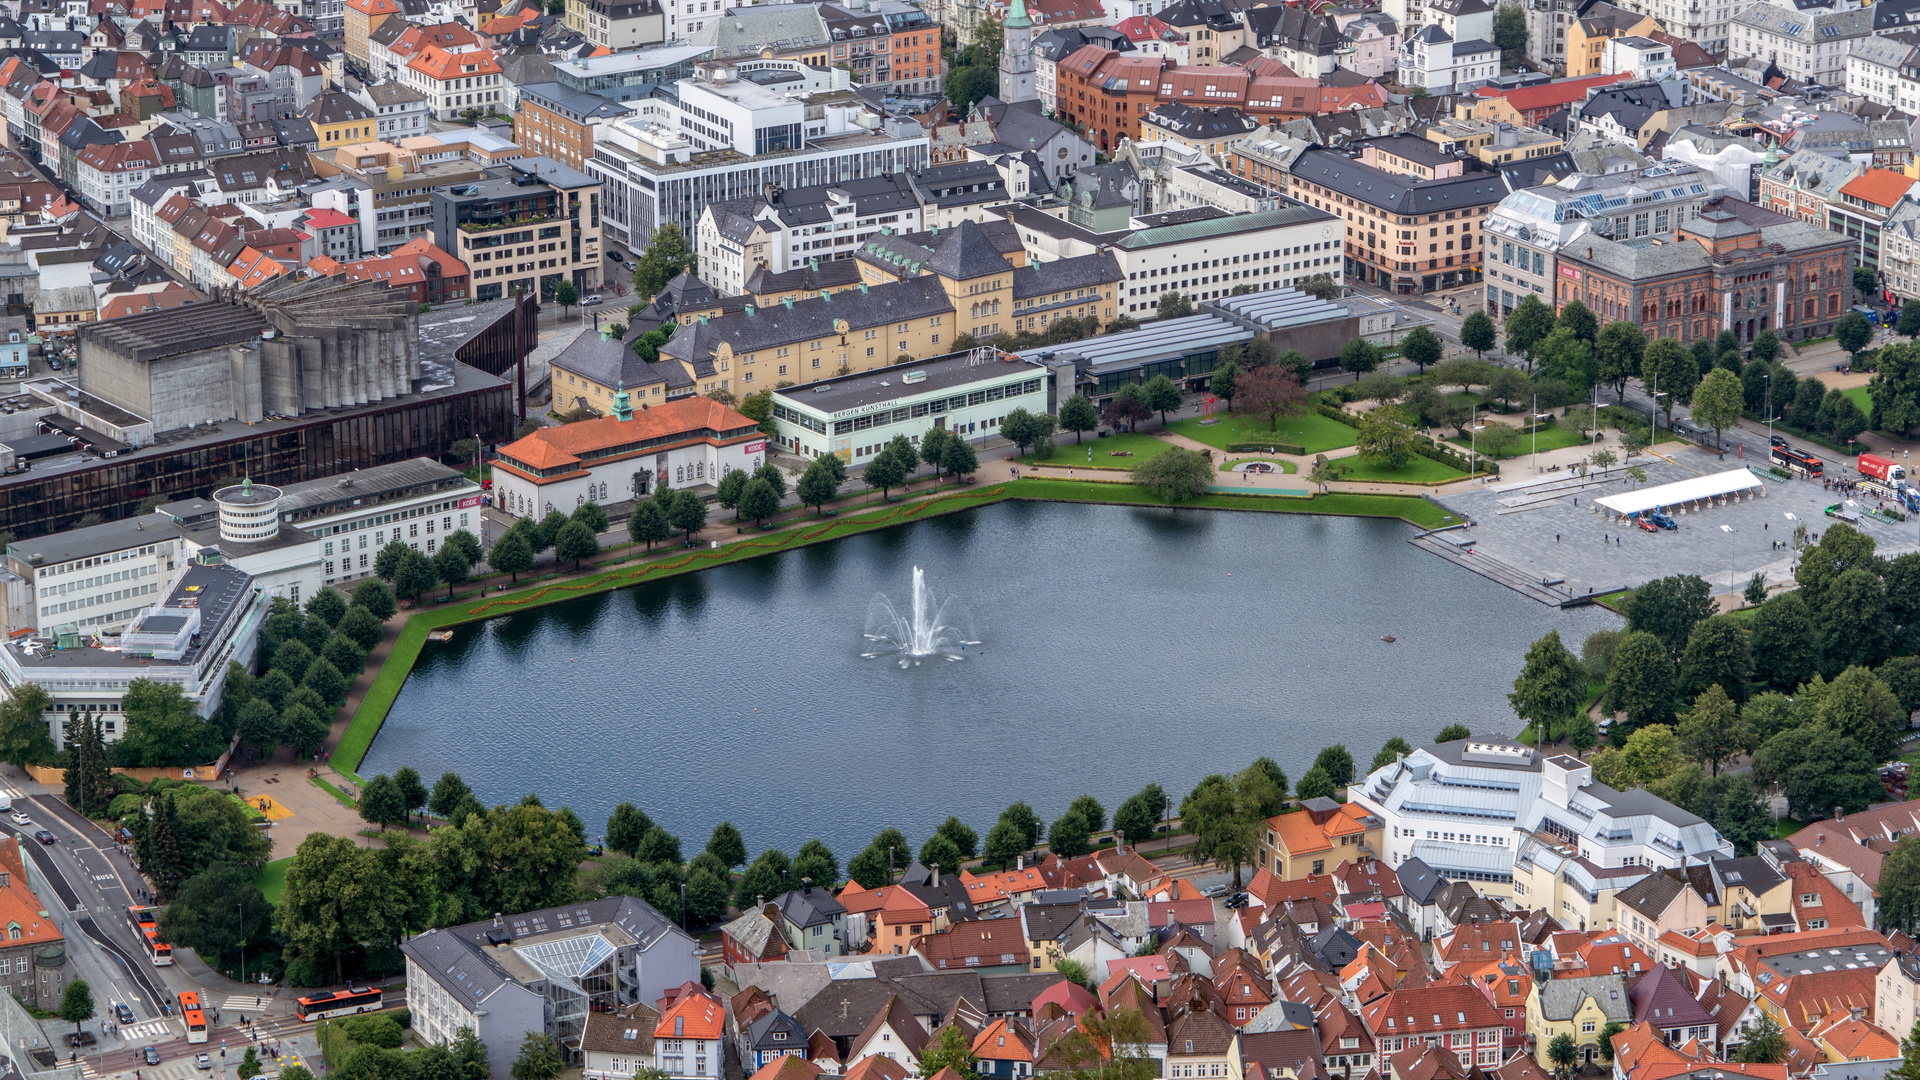 берген, норвегия, город, панорама